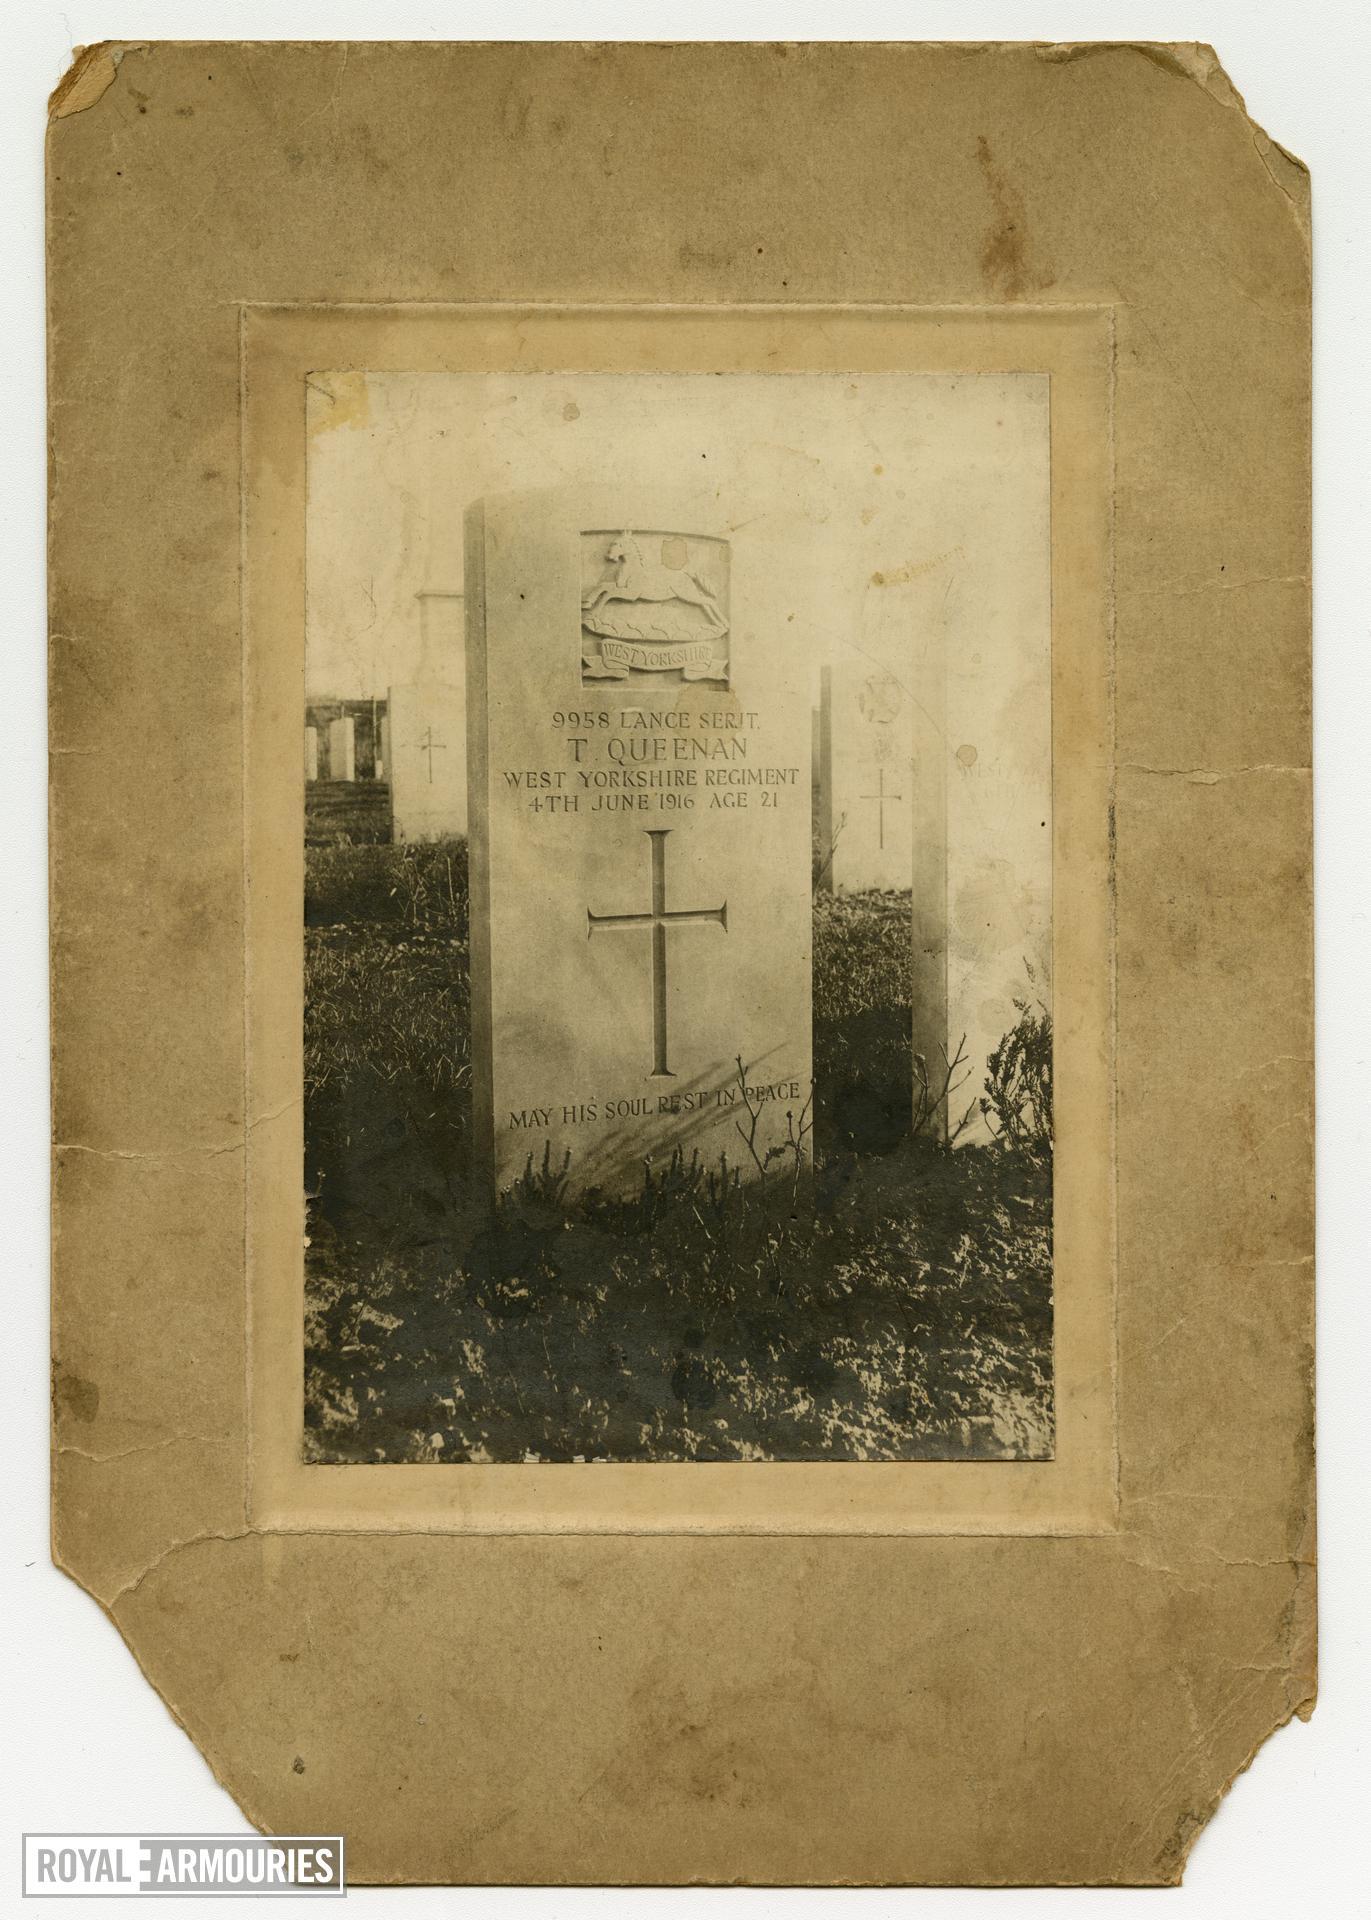 Head Stone of Lance Sergeant Thomas Queenan, 1st West Yorkshire Regiment, at Essex Farm Military Cemetary, Belgium. (XVIII.461)